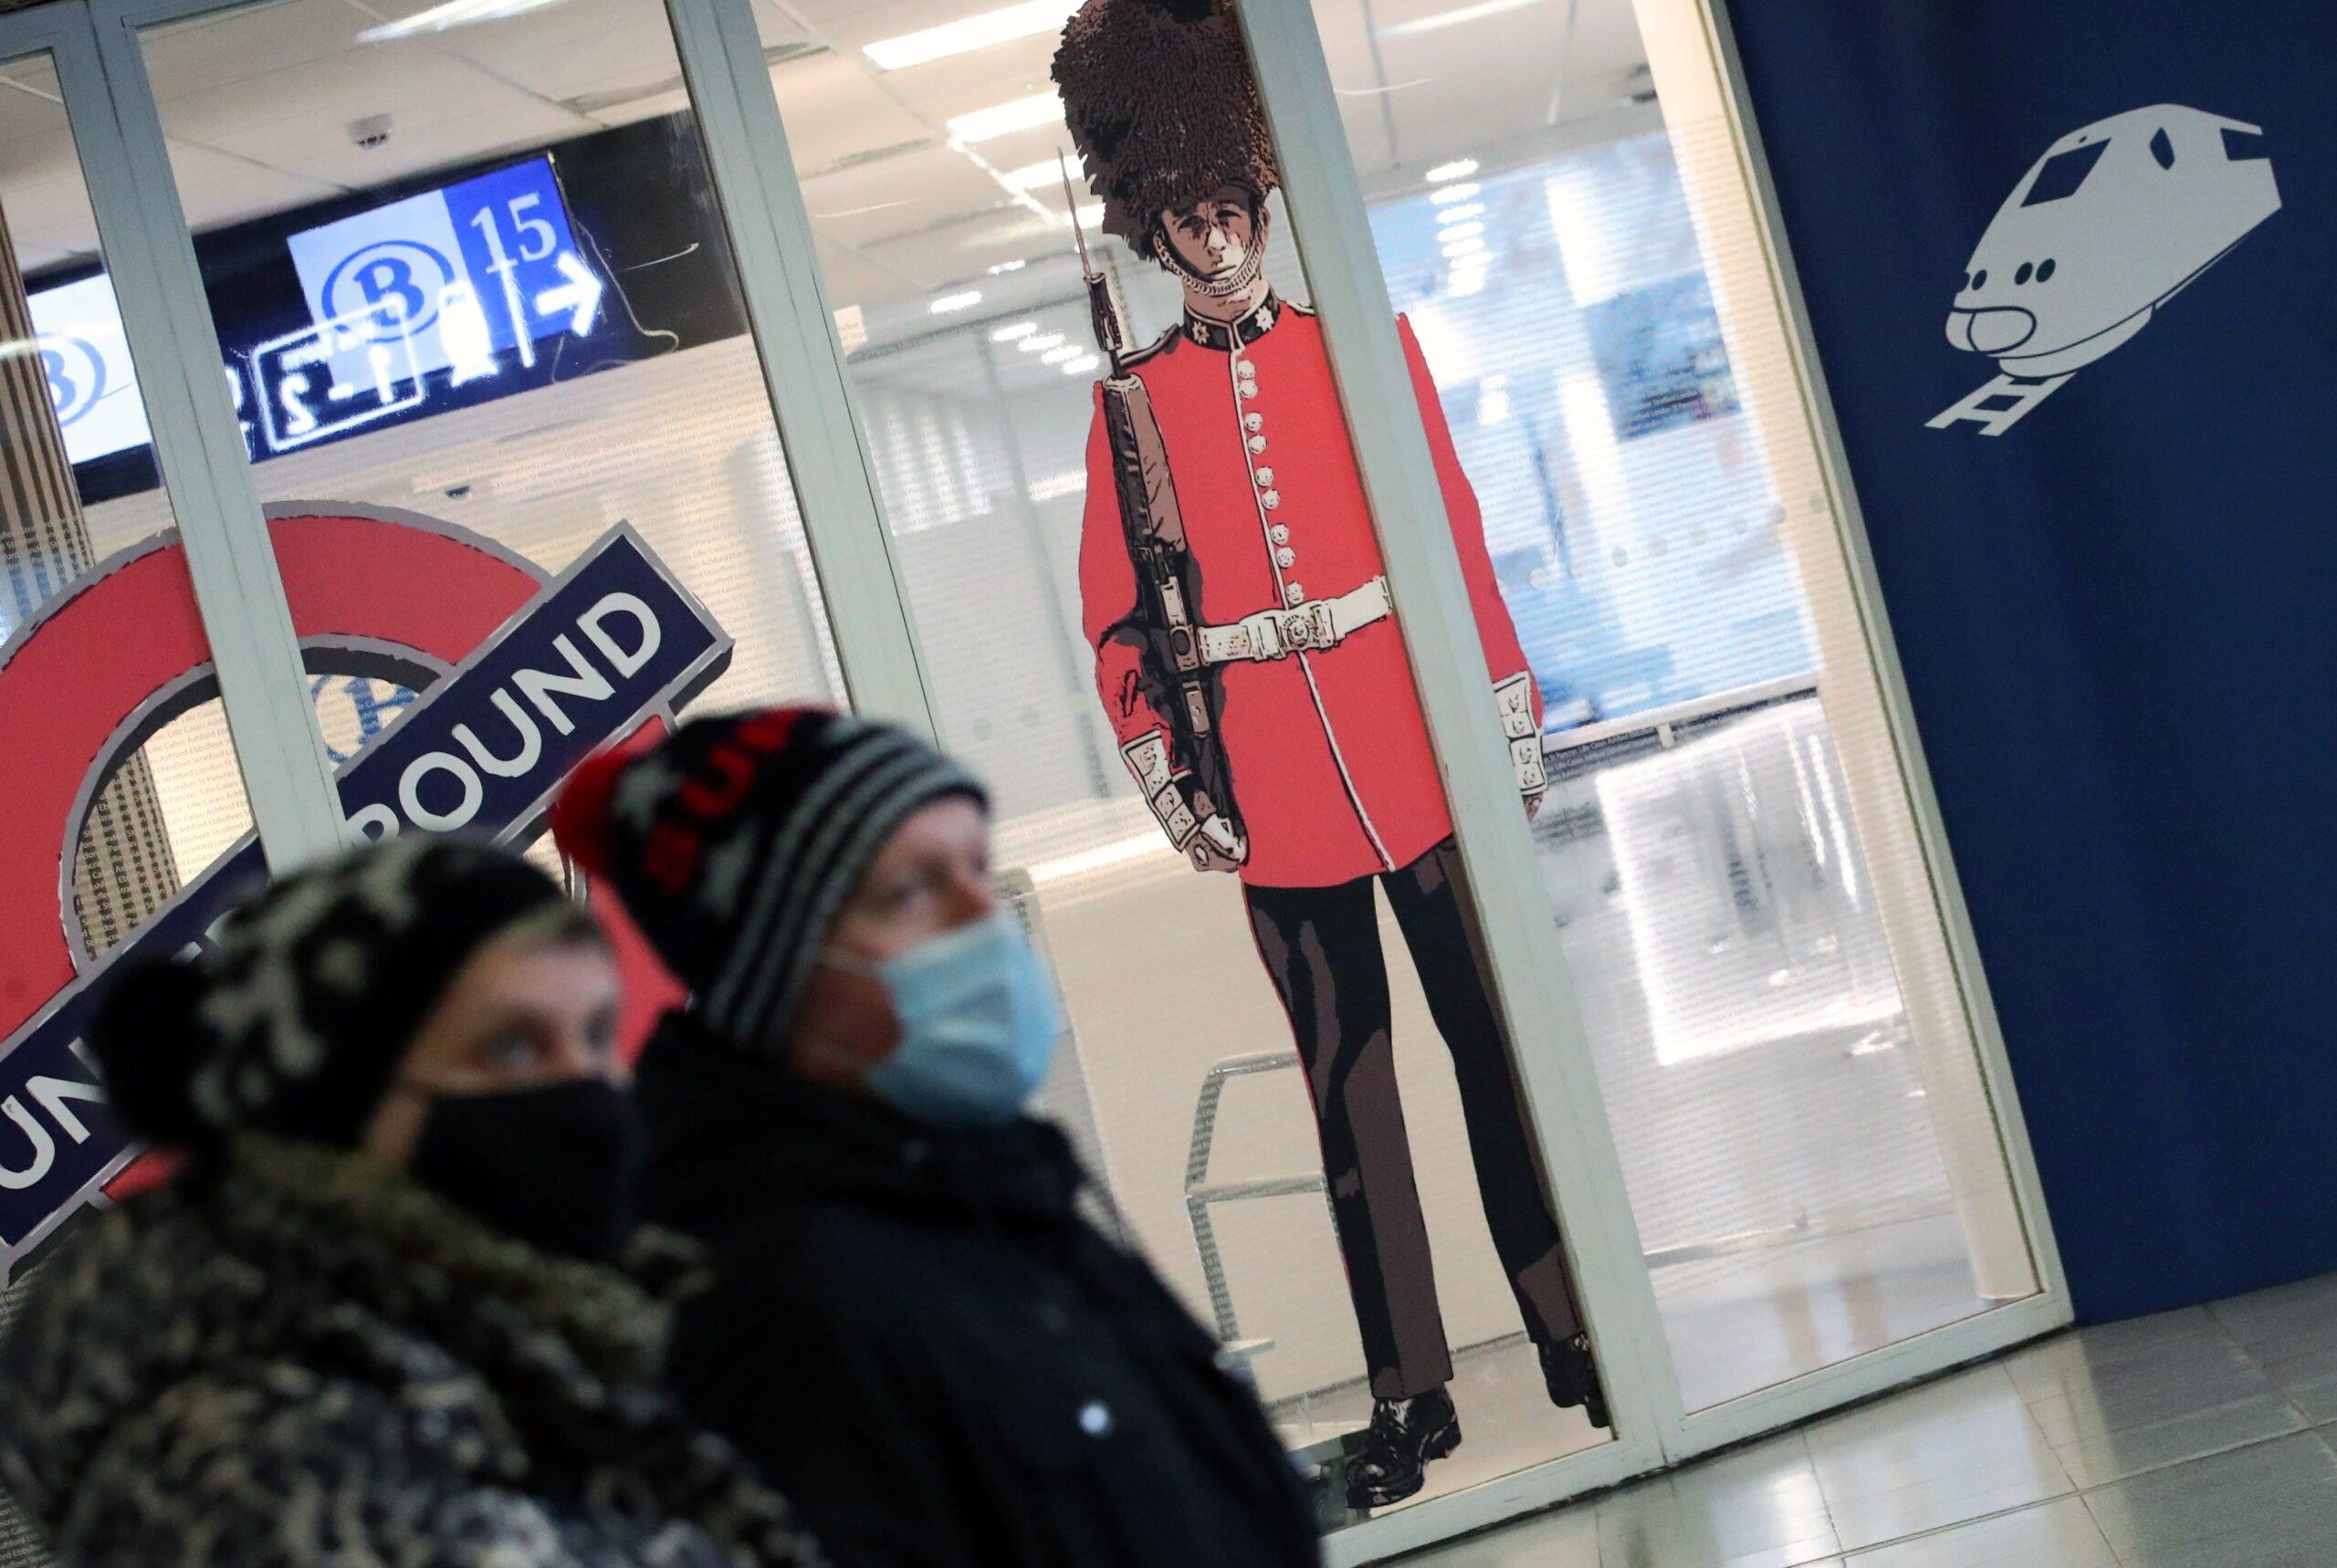 Coronavirus: Η Βρετανία αναφέρει τον ημερήσιο αριθμό νέων περιπτώσεων, ξεπερνώντας τις 40.000